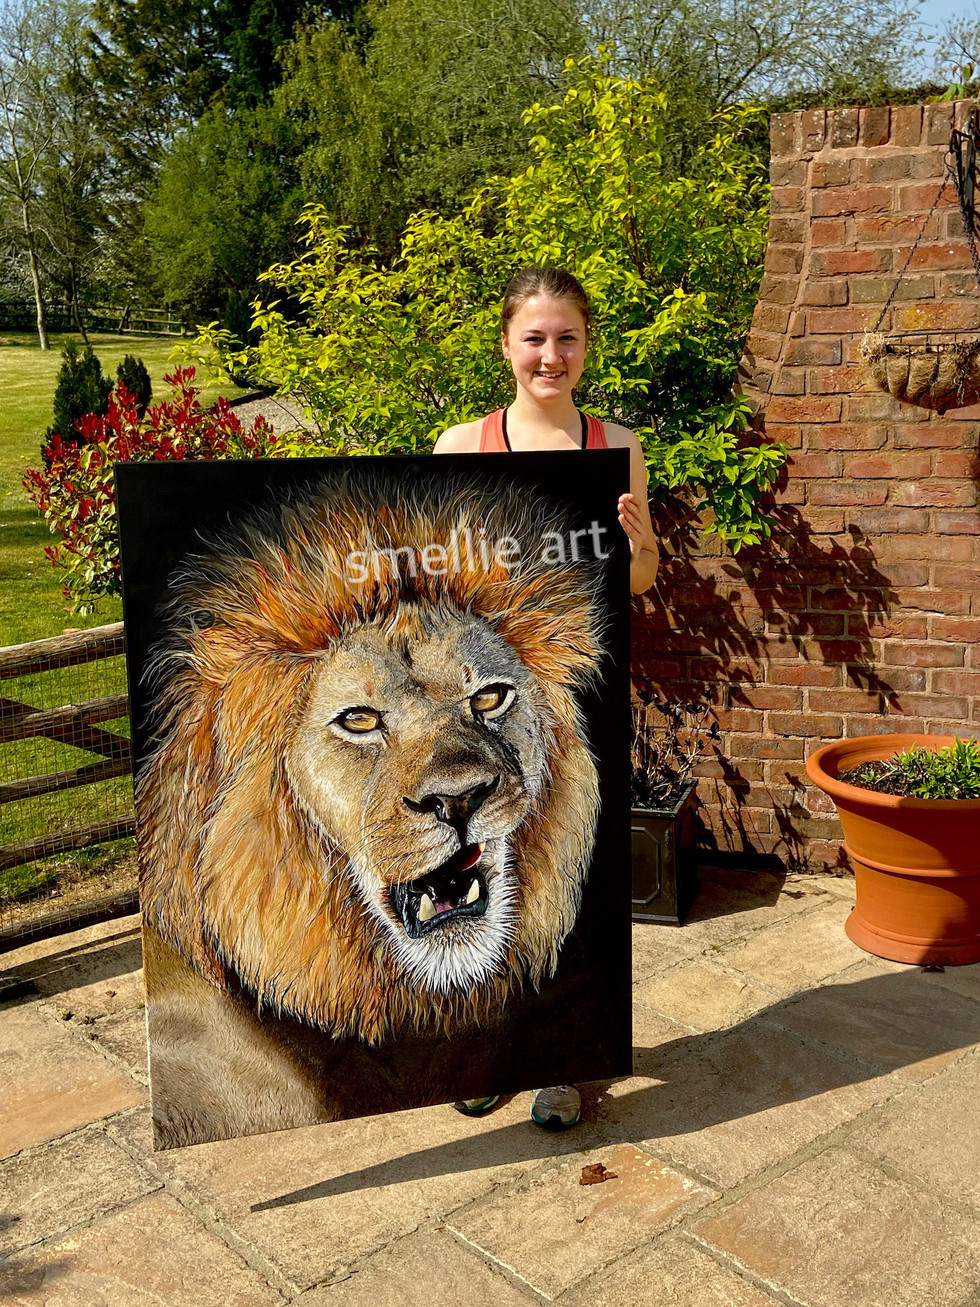 Lion and Artist (SMELLIE ART)